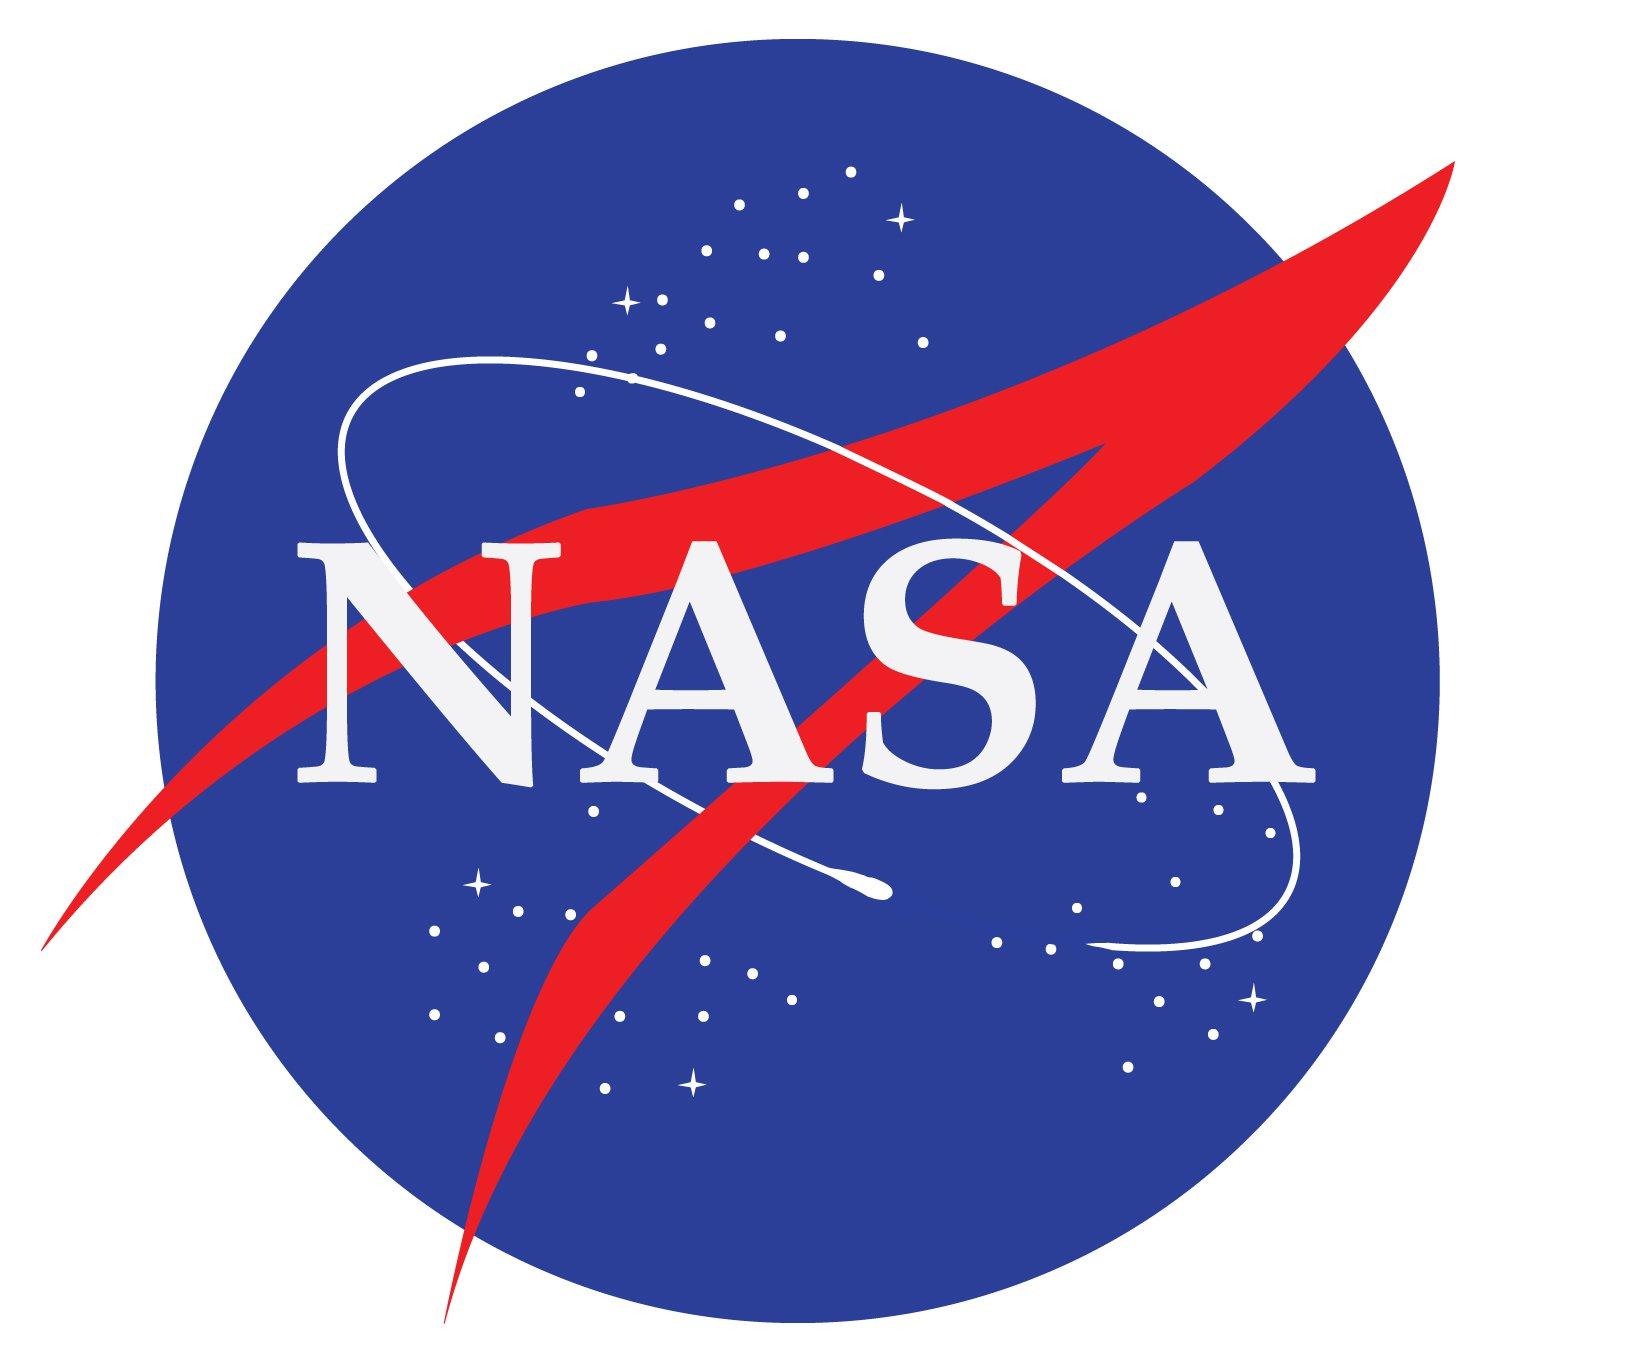 Free Nasa Logo, Download Free Clip Art, Free Clip Art on.